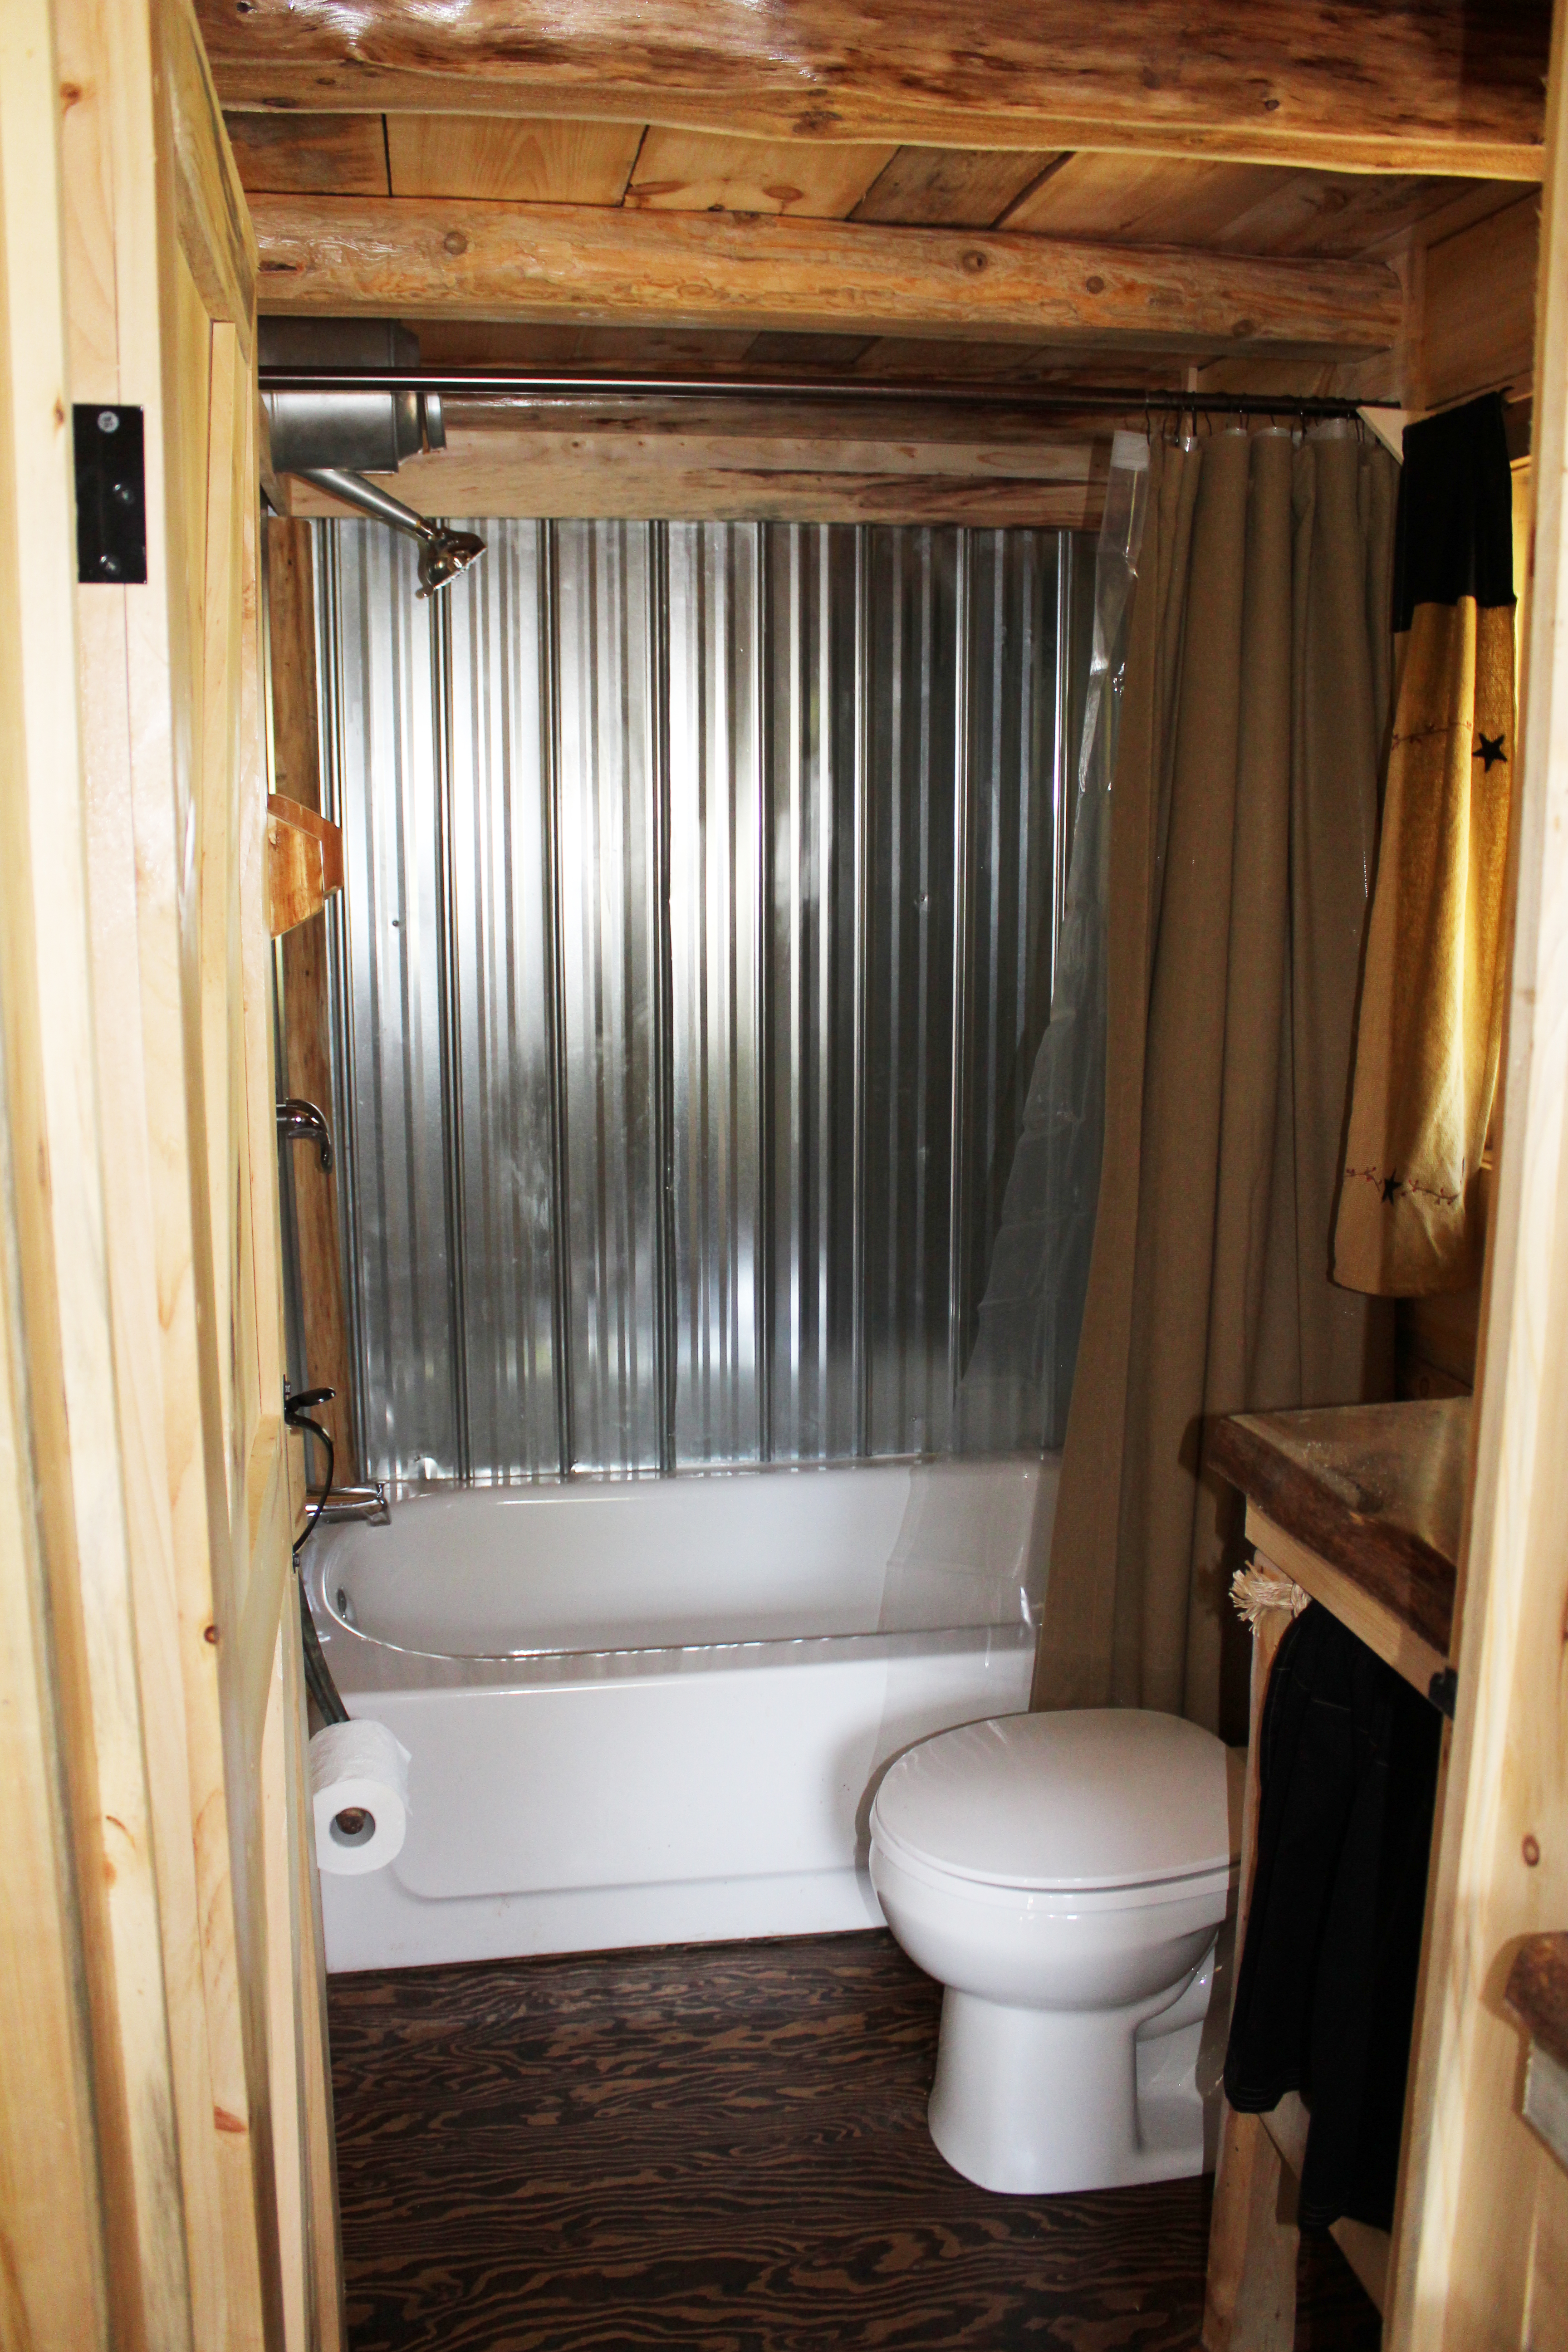 Full size tub/shower bathroom.